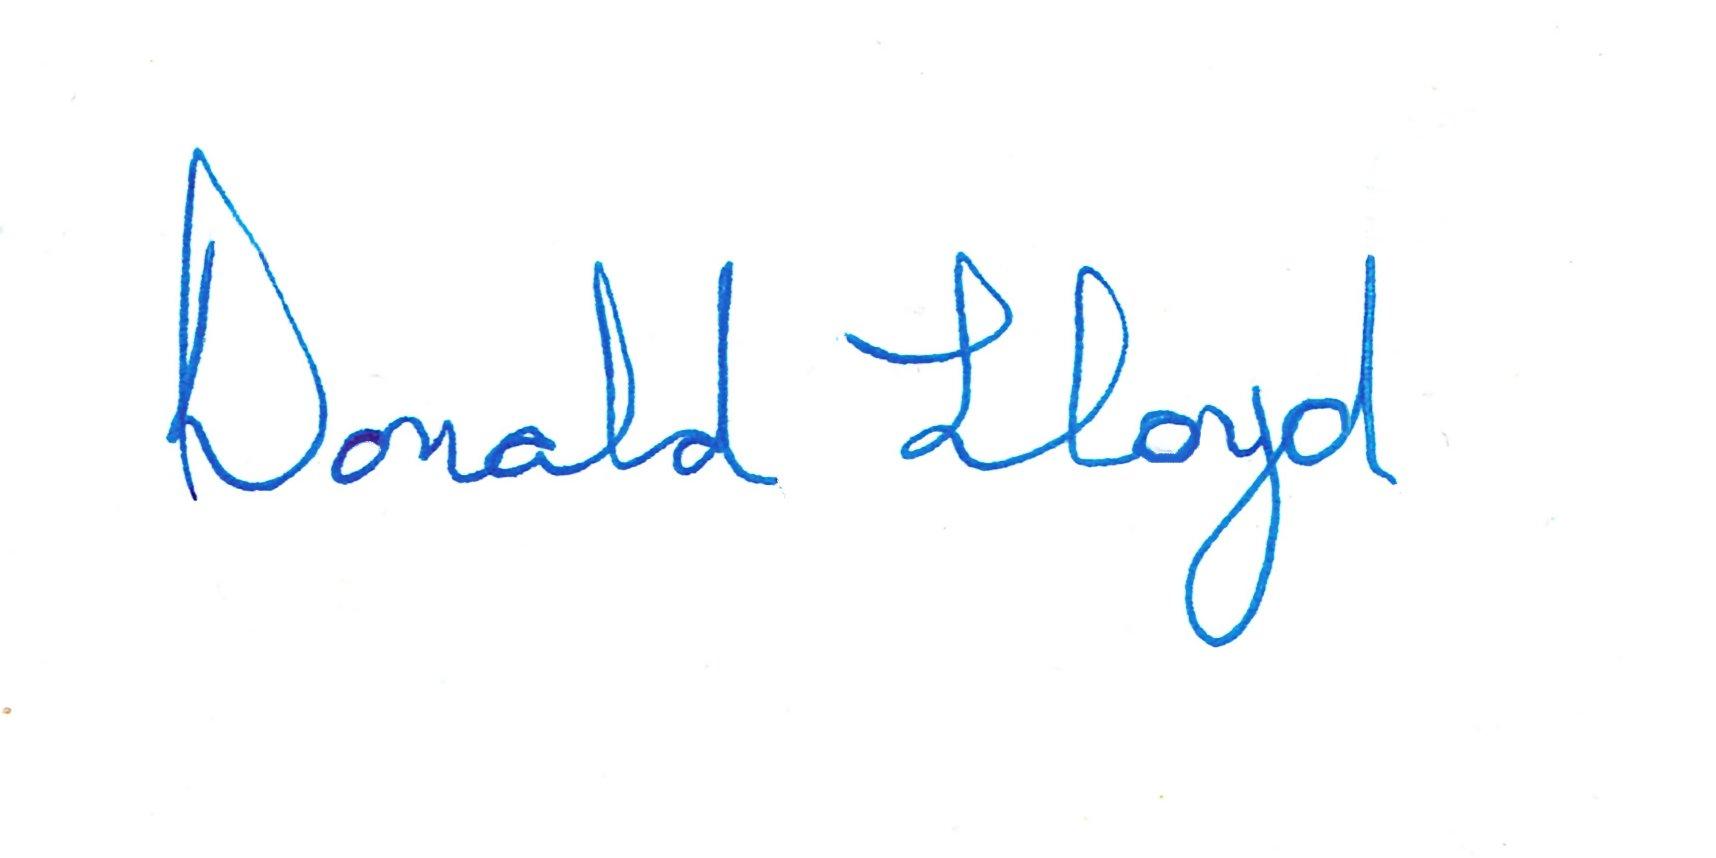 Donald Lloyd Signature